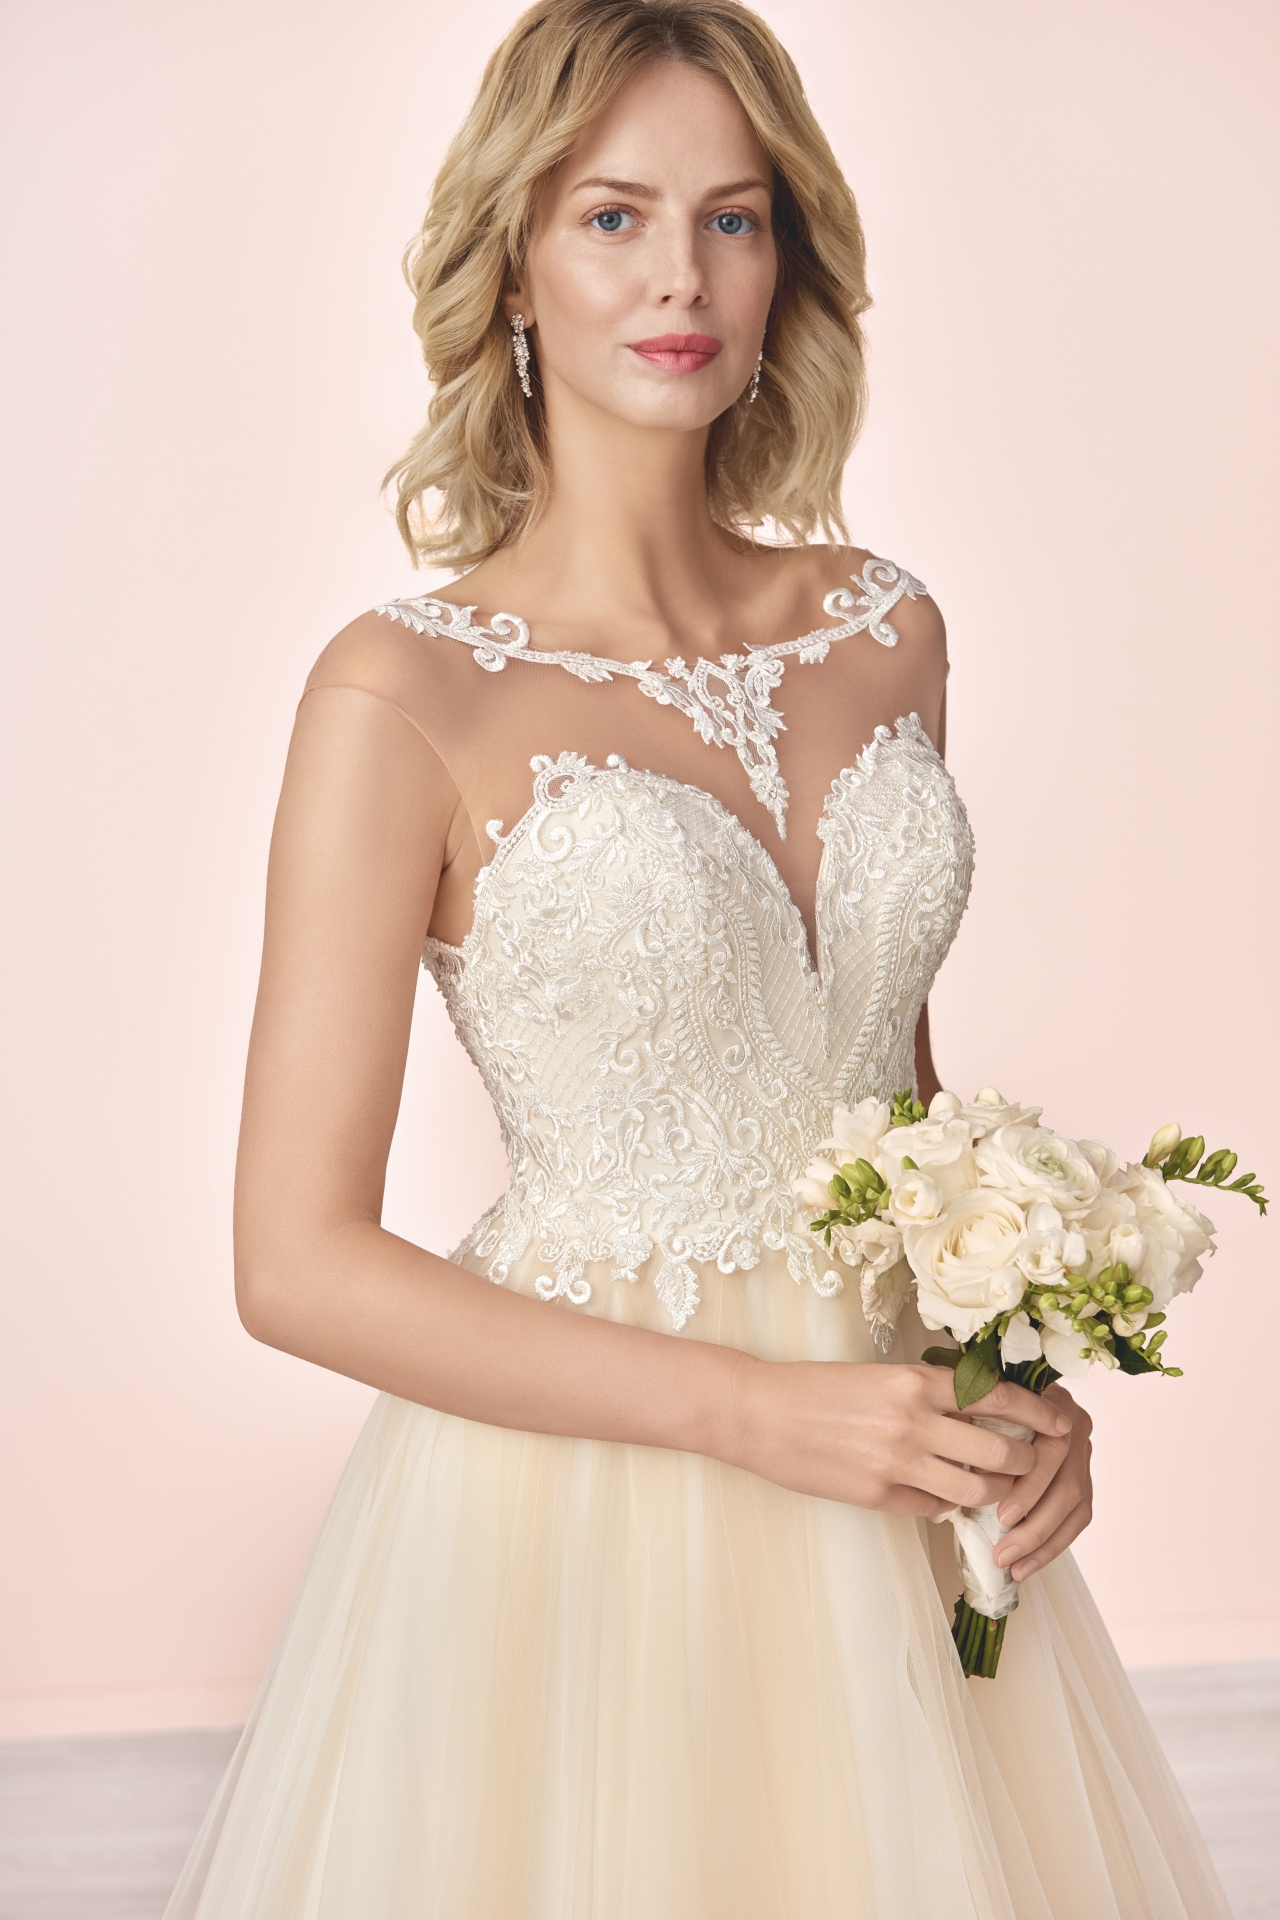 Brautkleid Elizabeth Konin 2019 - 4129T-0